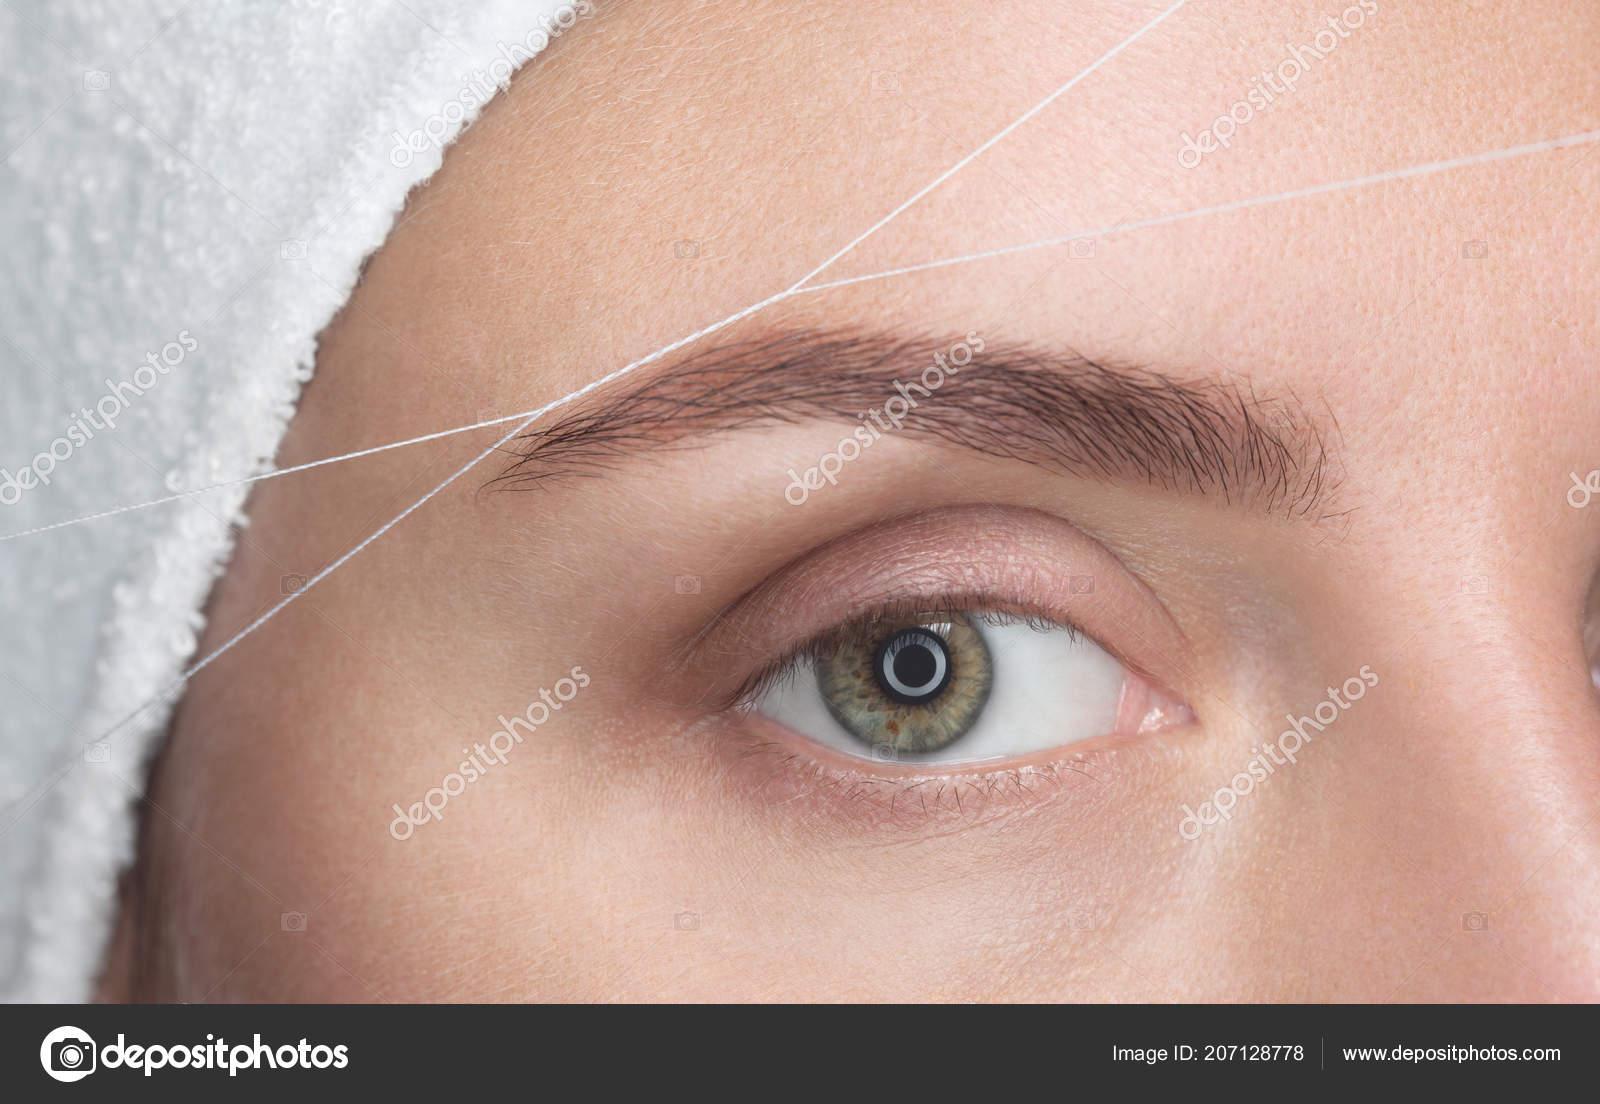 Make Artist Plucks Her Eyebrows Thread Close Face Care Beauty